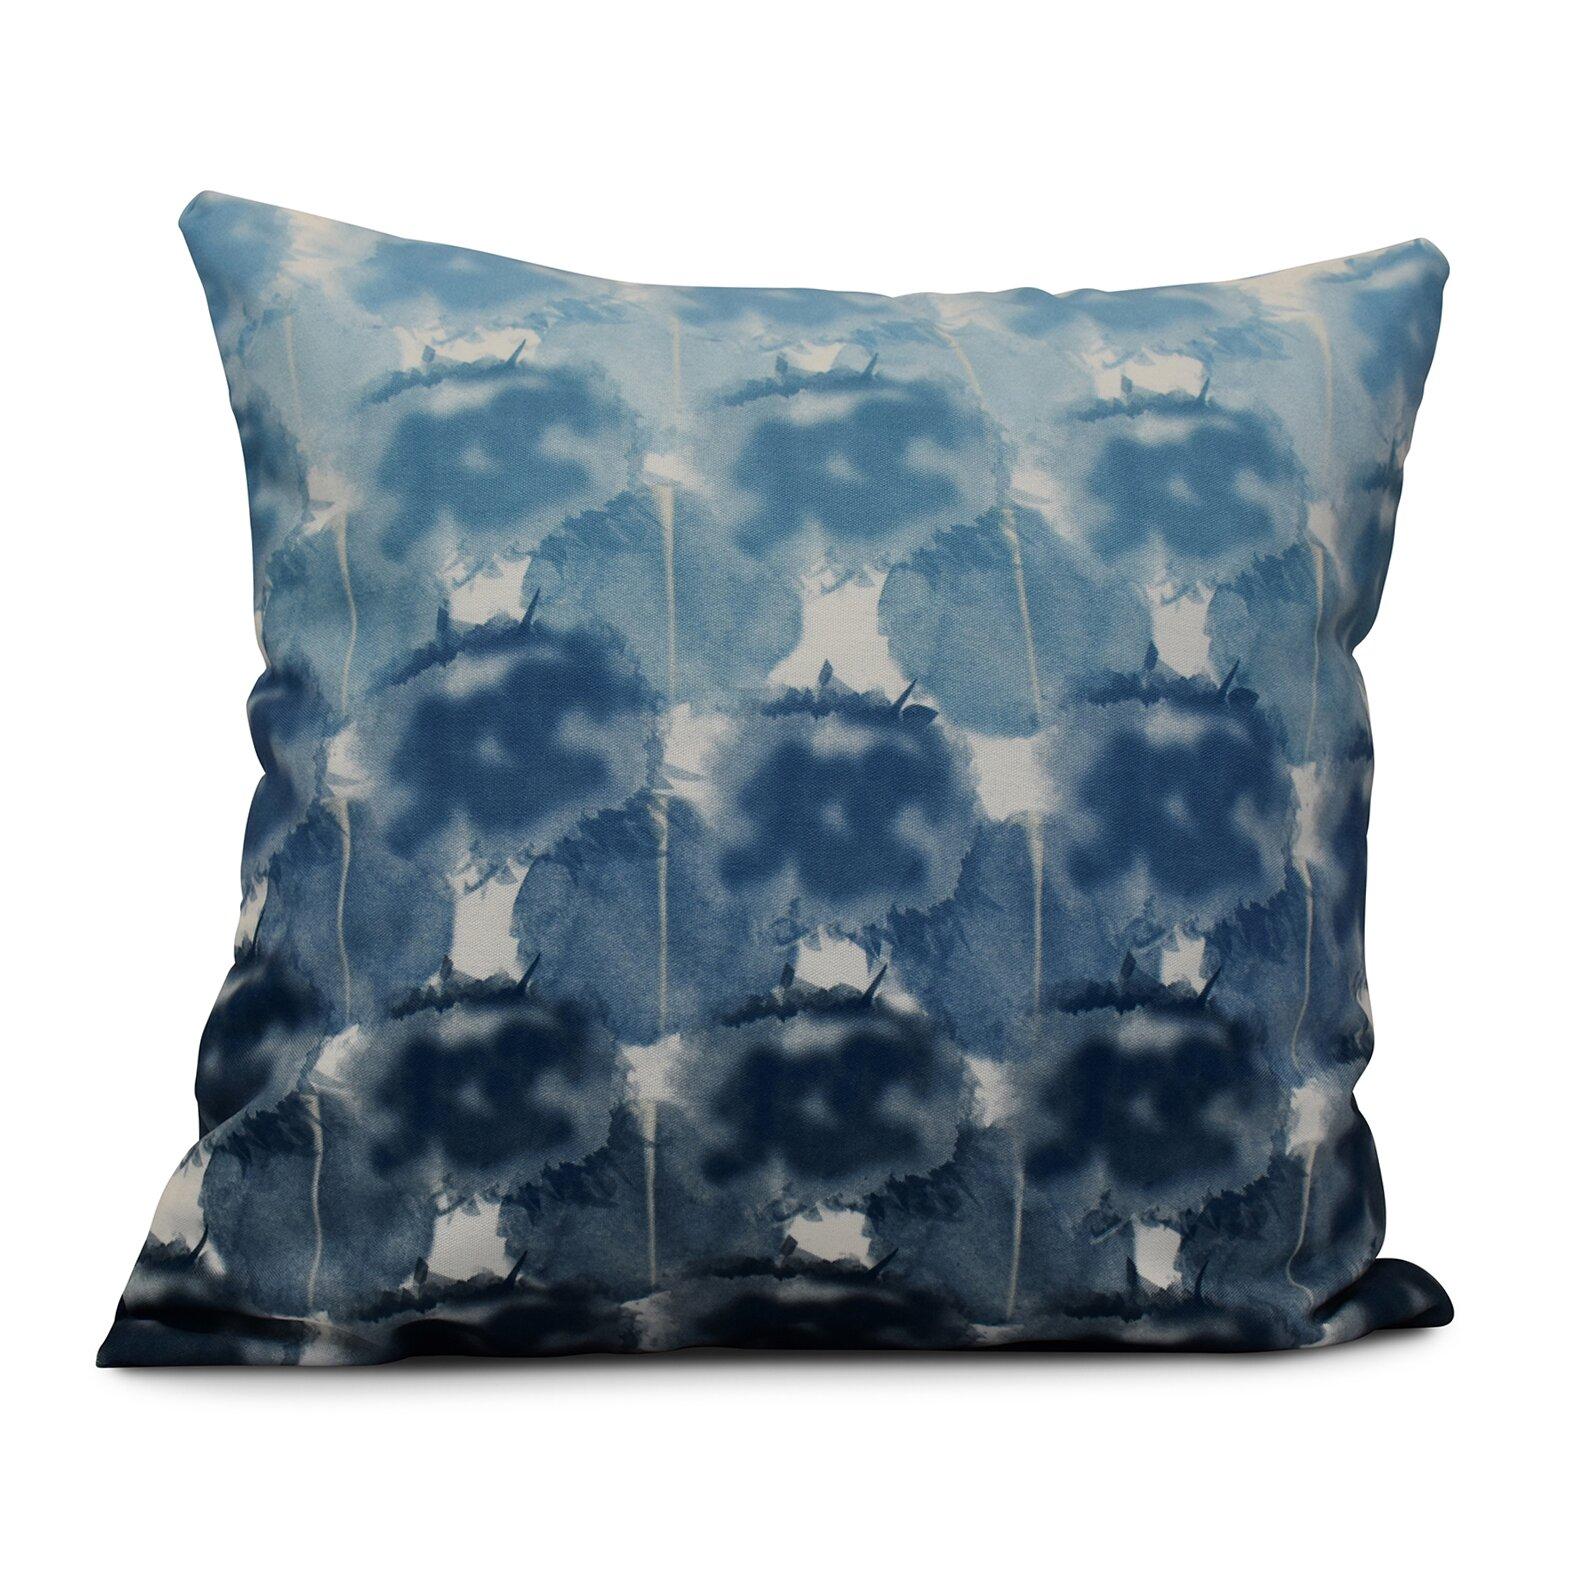 Outdoor Beach Throw Pillows : World Menagerie Rafia Beach Clouds Indoor/Outdoor Throw Pillow Wayfair